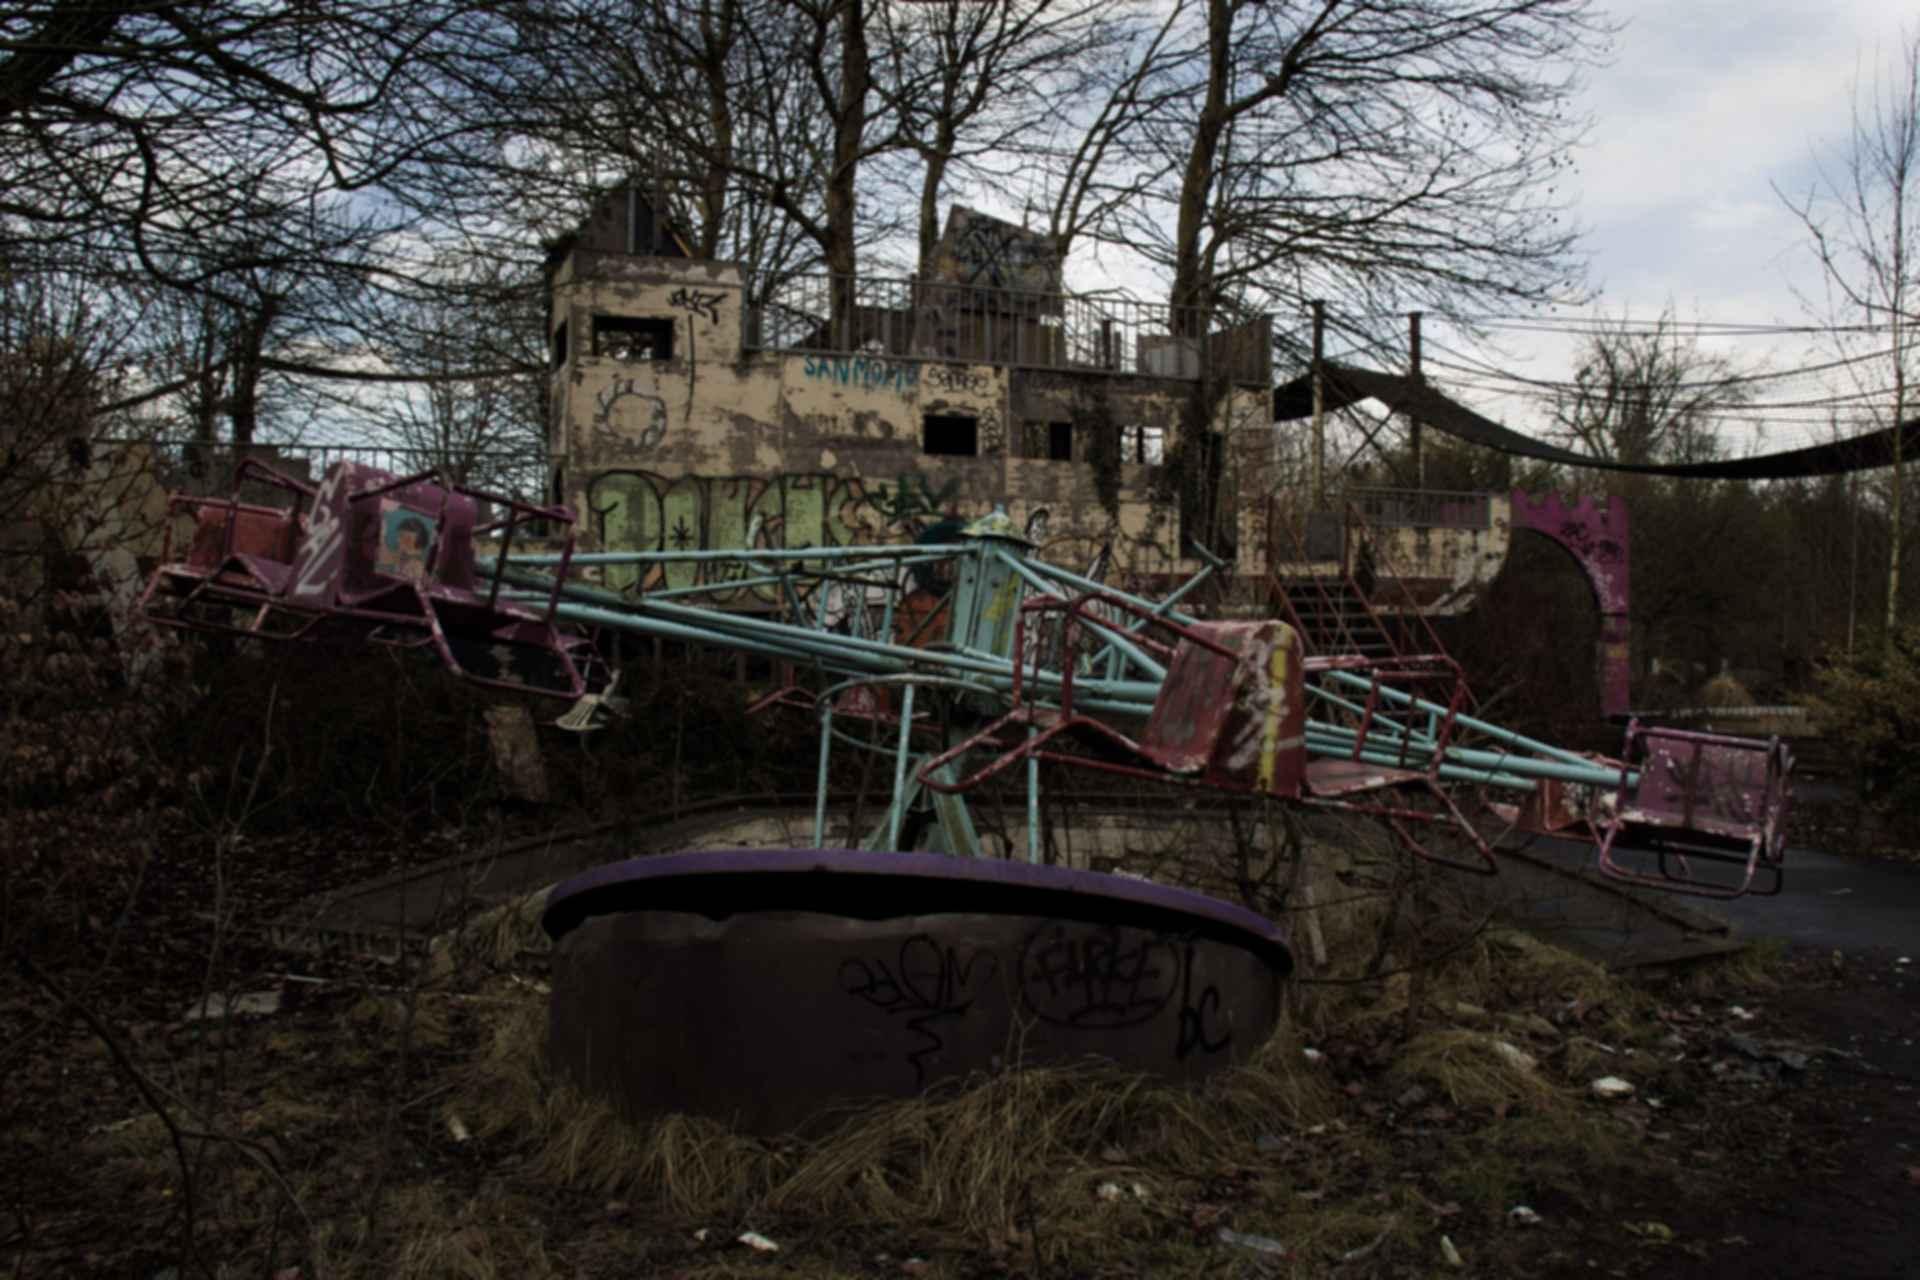 Dadipark Amusement Park - Run-down rides